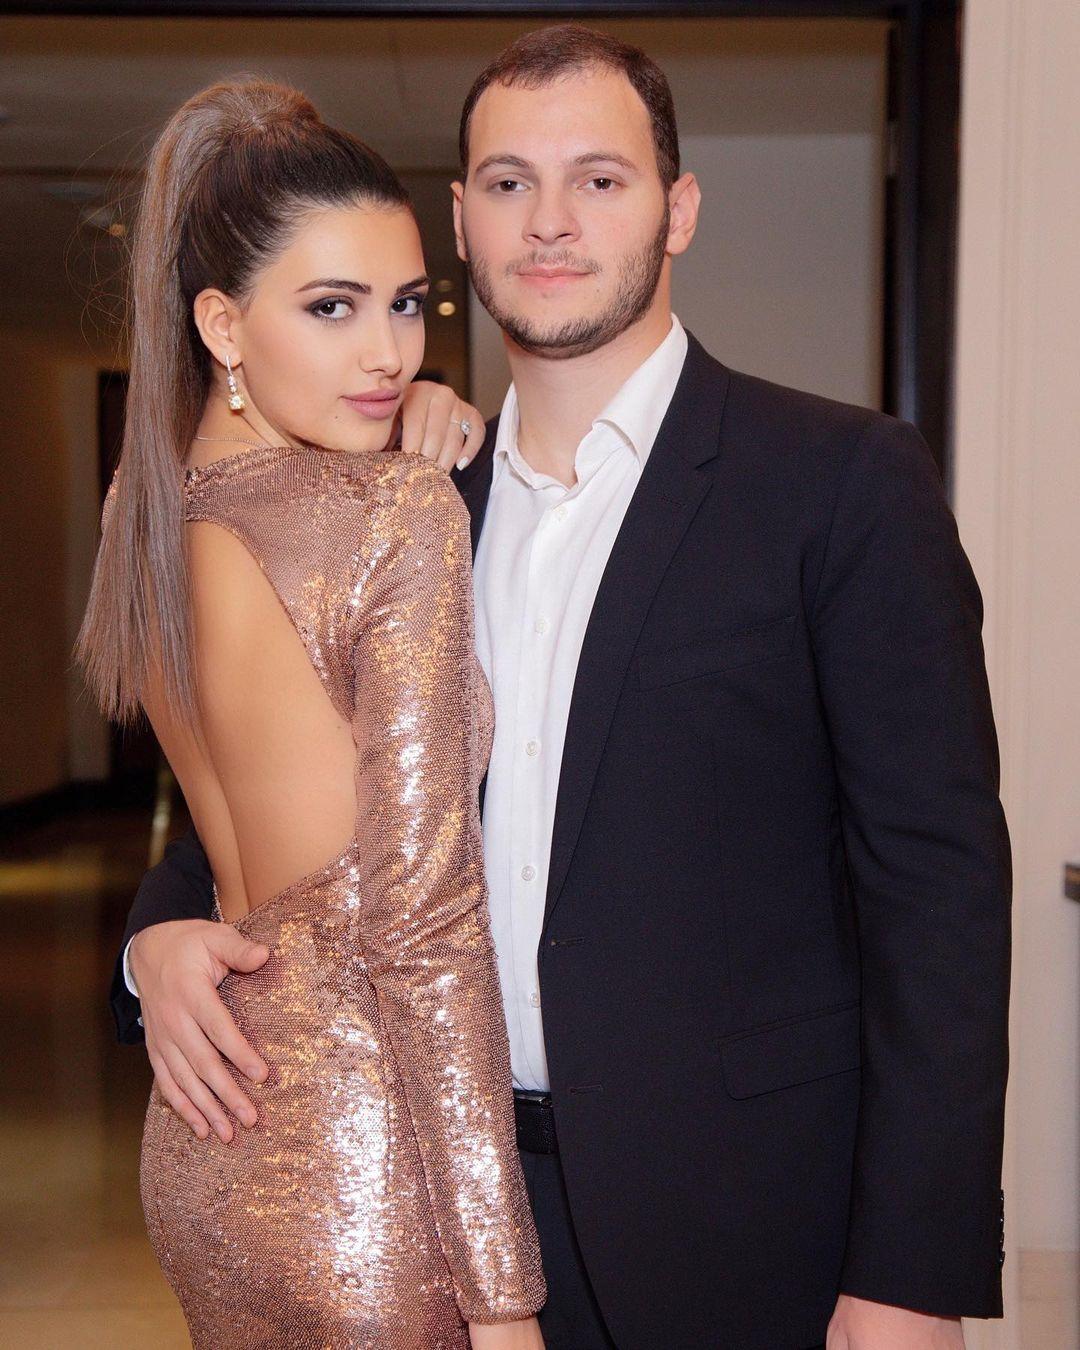 Мария с мужем Аркадием. Фото: @masha_chigirinskaya